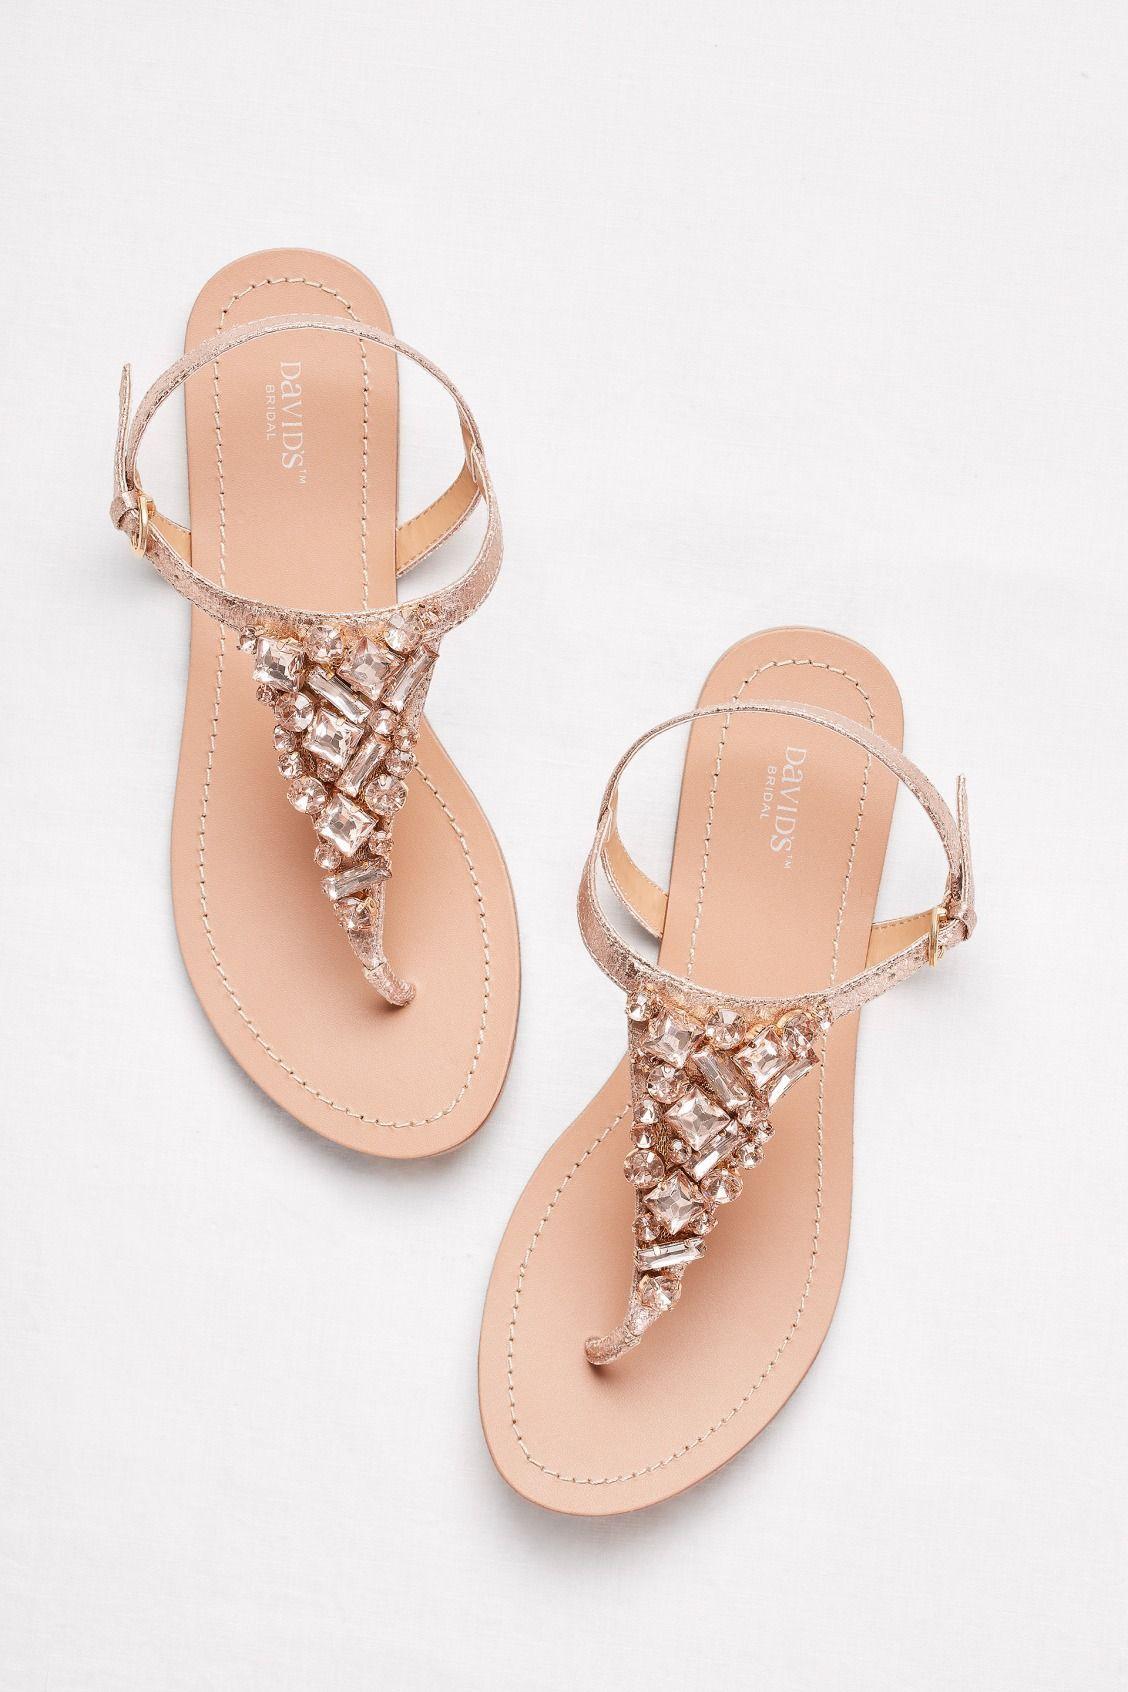 38af0101c854 Jeweled Rose Gold Metallic Ankle-Strap Thong Sandals by David s Bridal